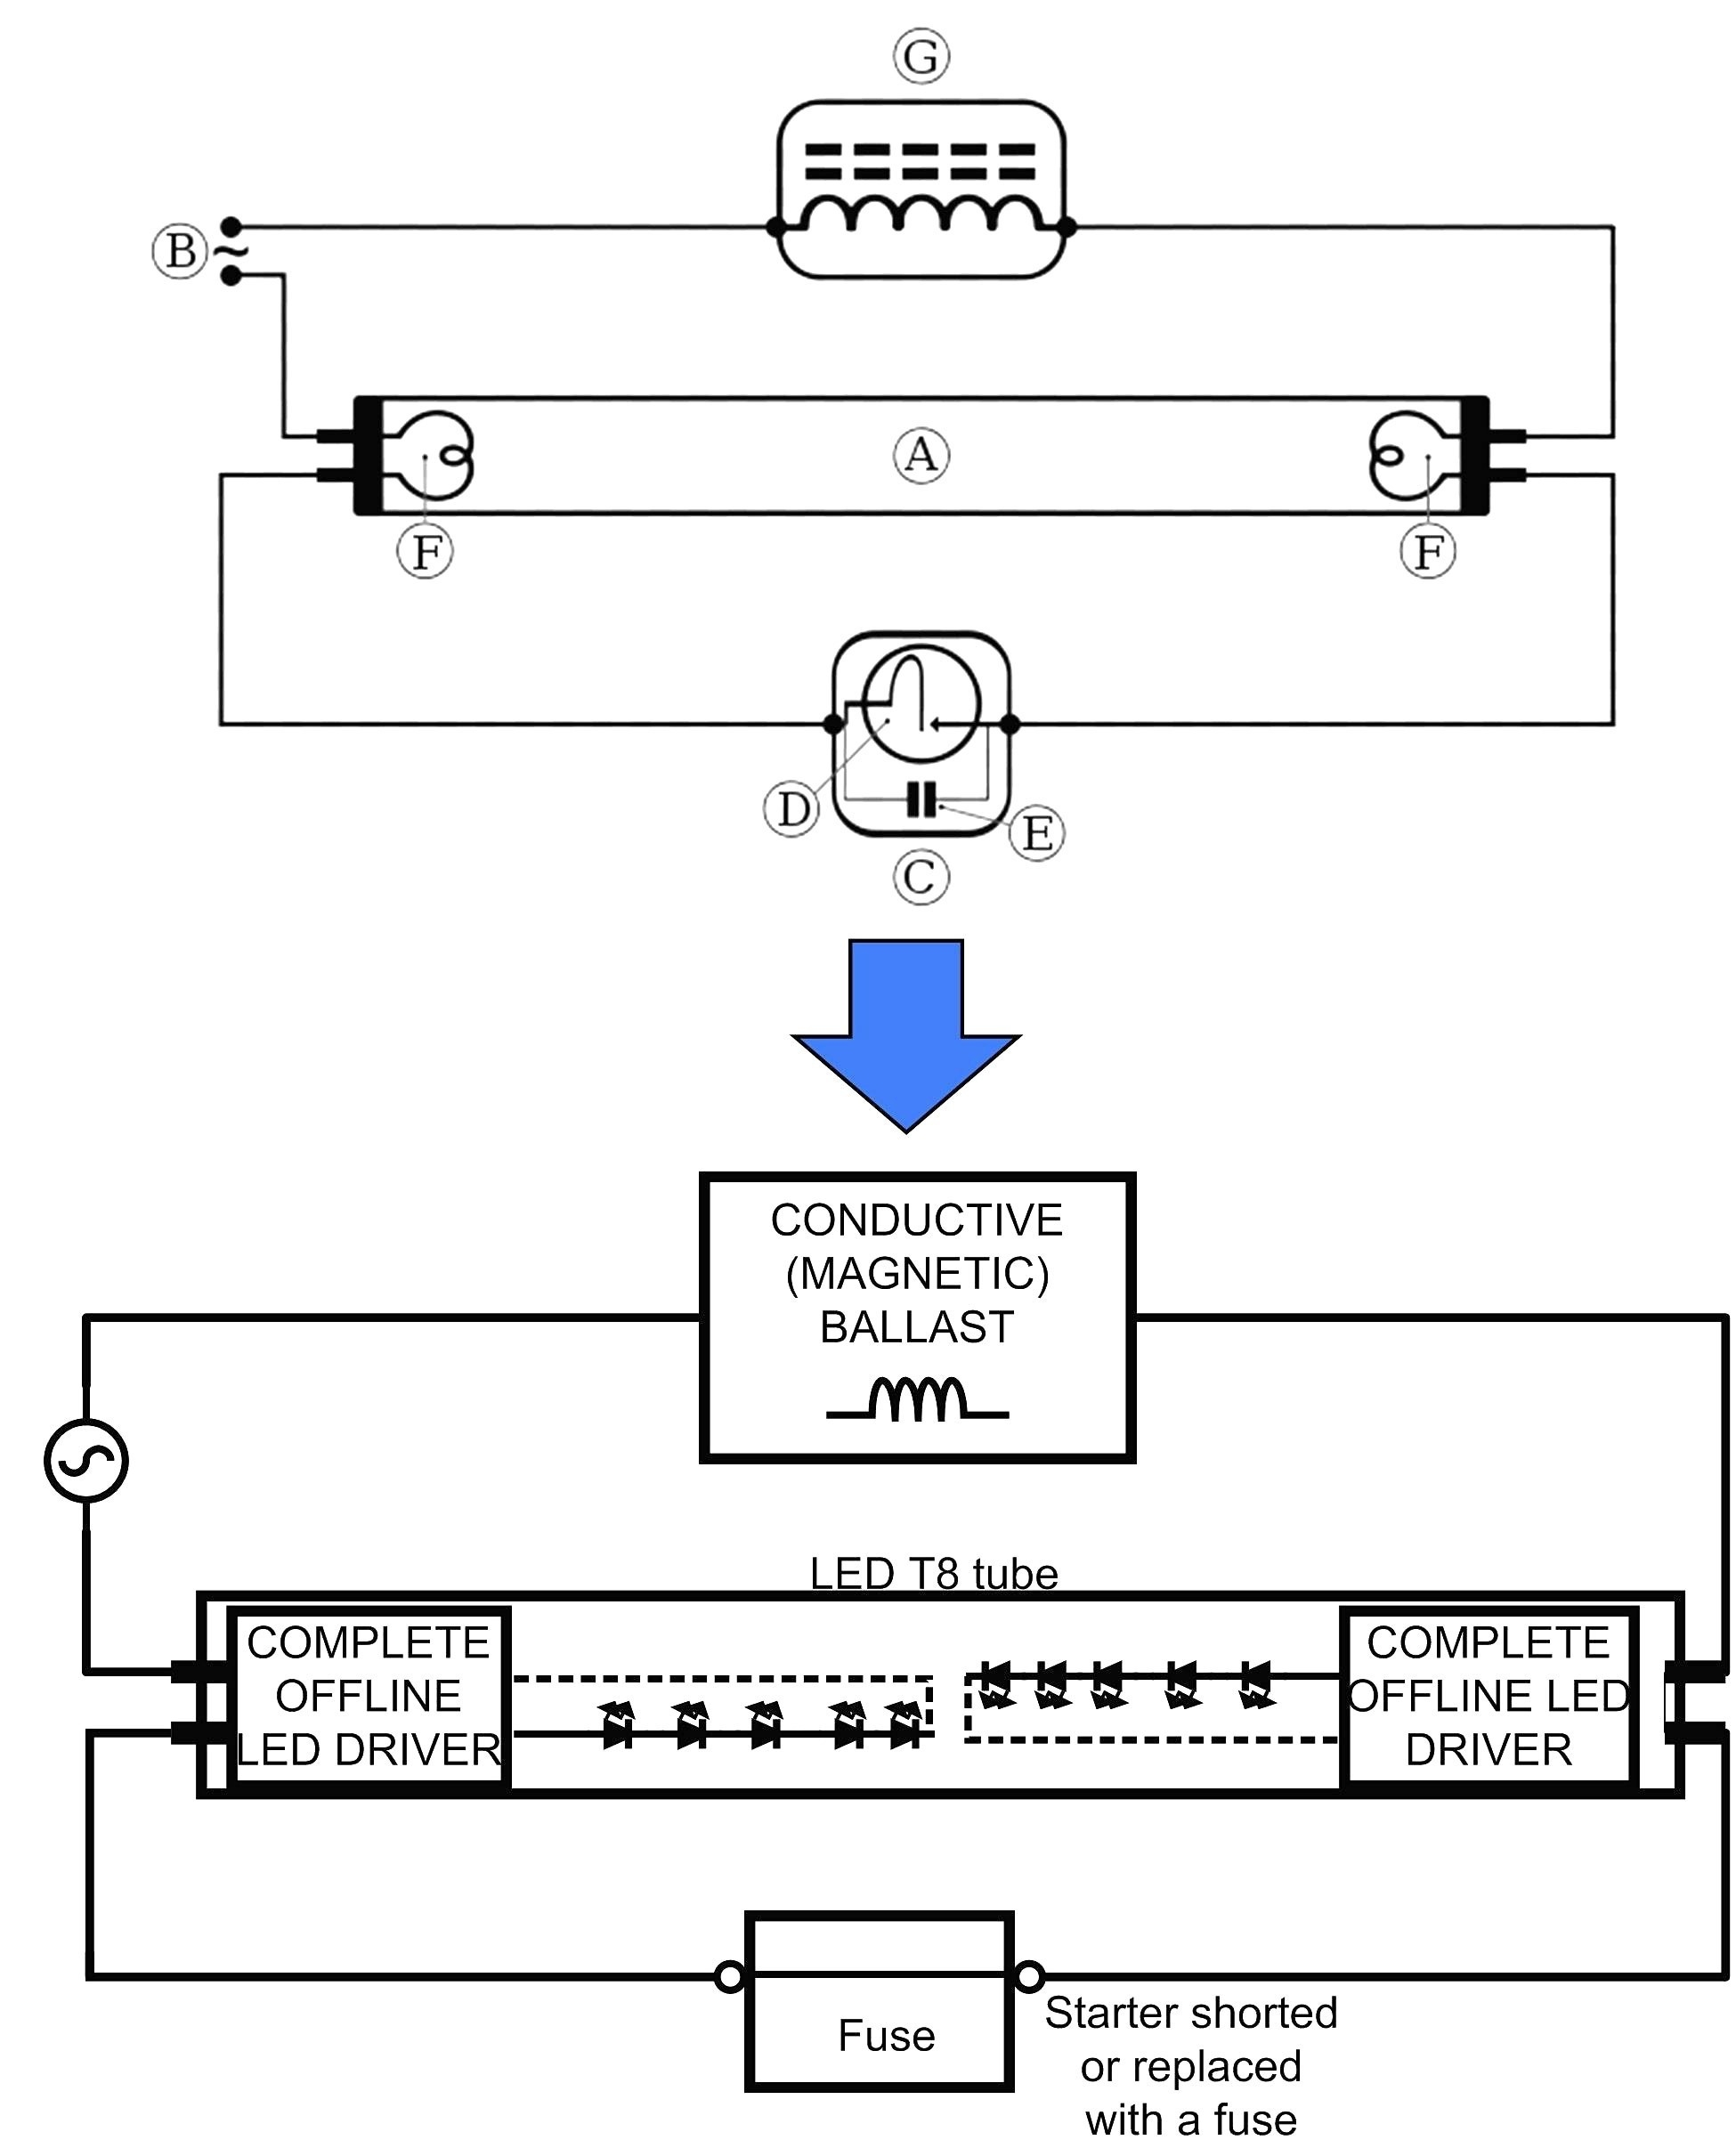 t8 led tube wiring diagram - wiring diagram for led fluorescent light new wiring  diagram led